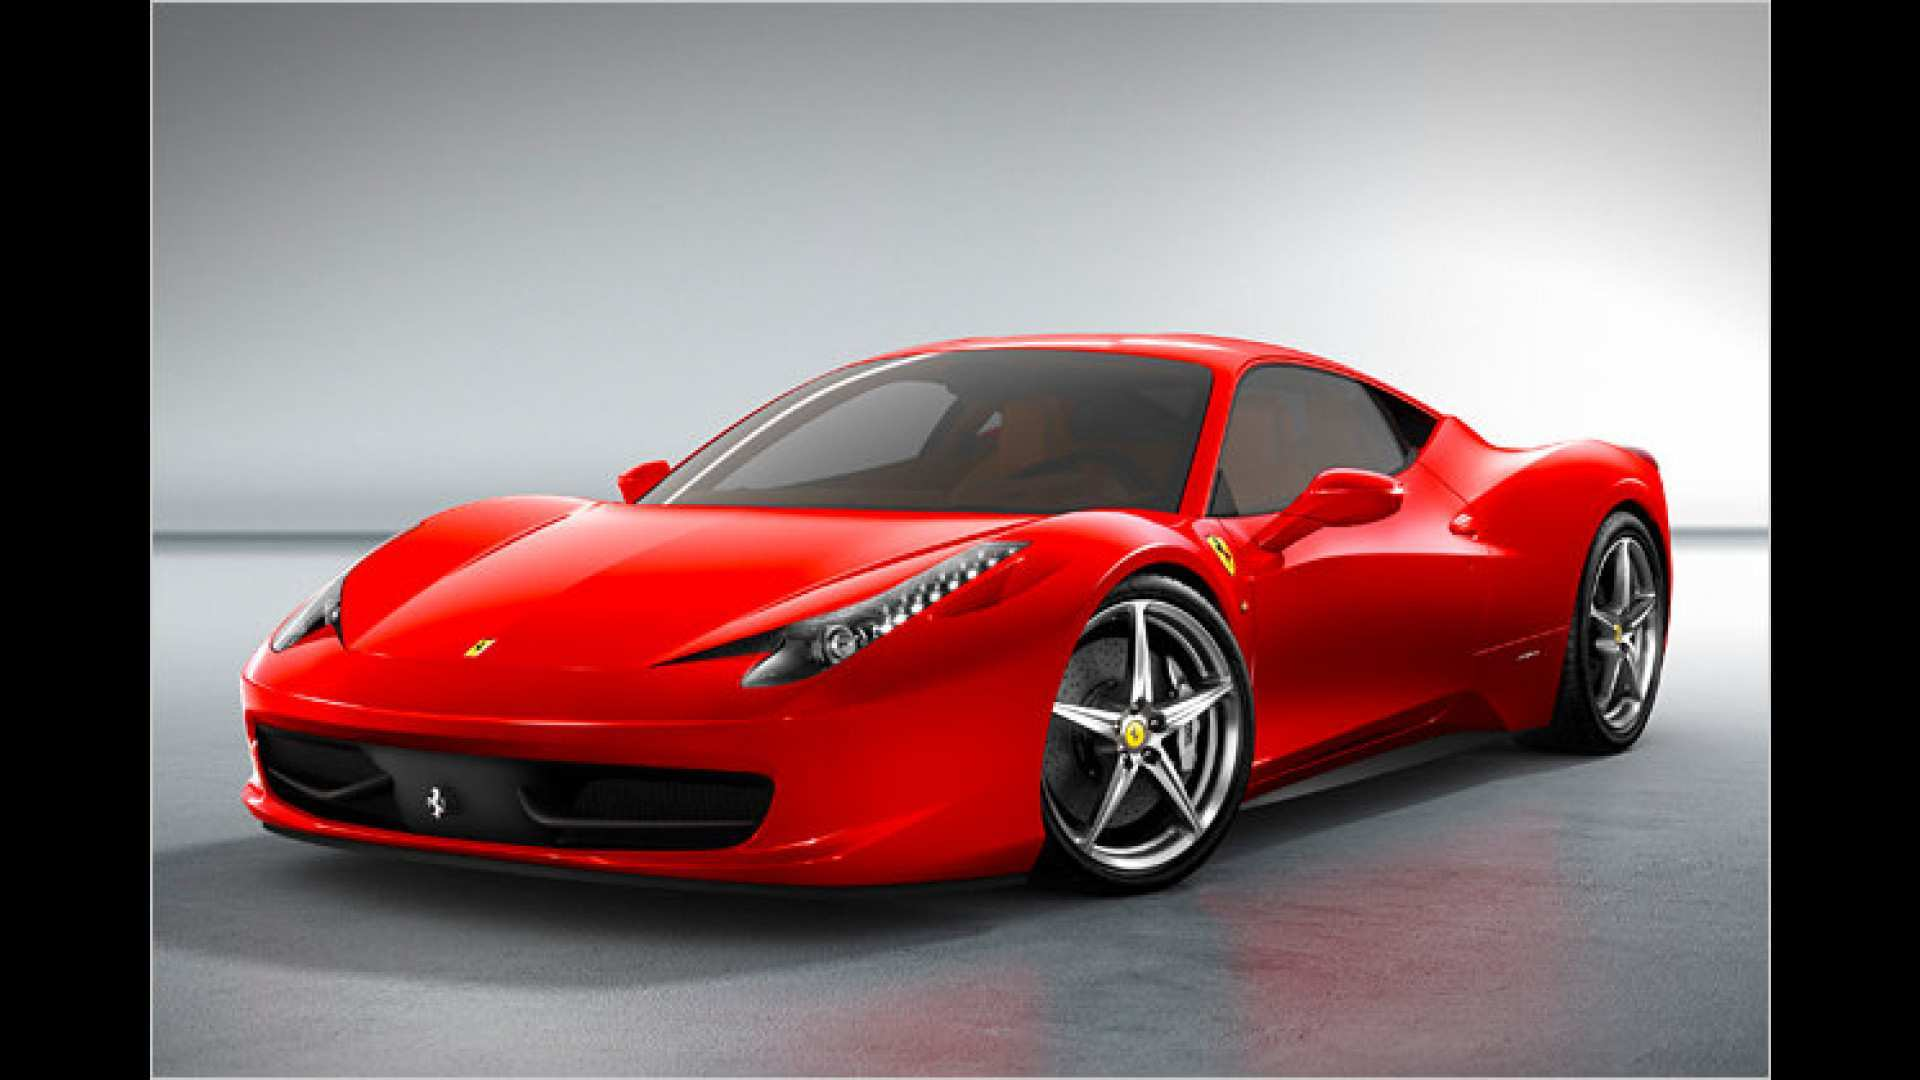 79 Great Ferrari 458 Picture Research New with Ferrari 458 Picture